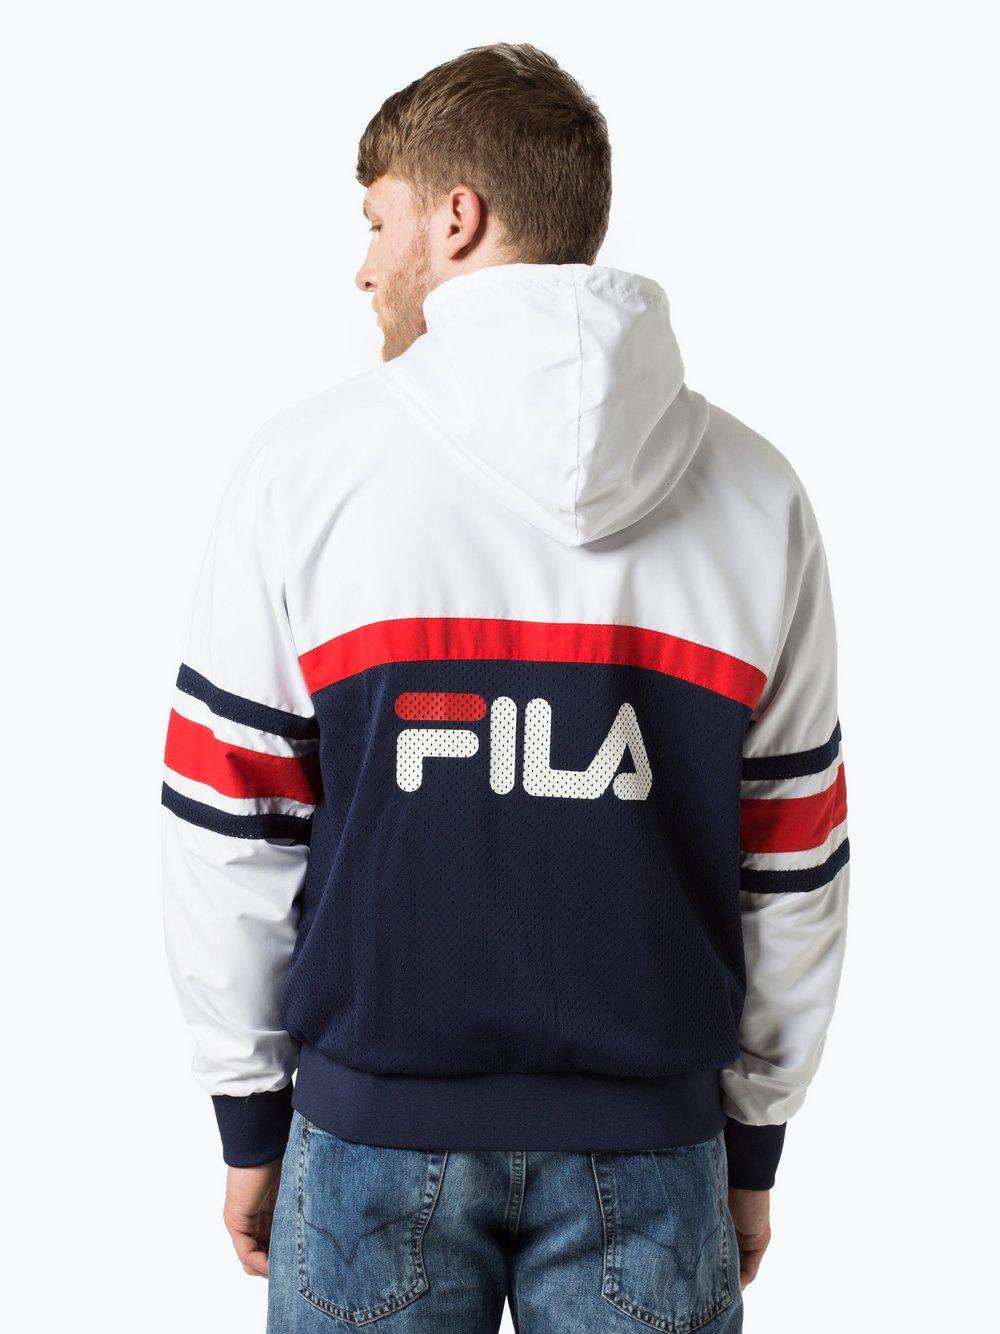 FILA Herren Jacke - Vendor online kaufen | PEEK-UND ...